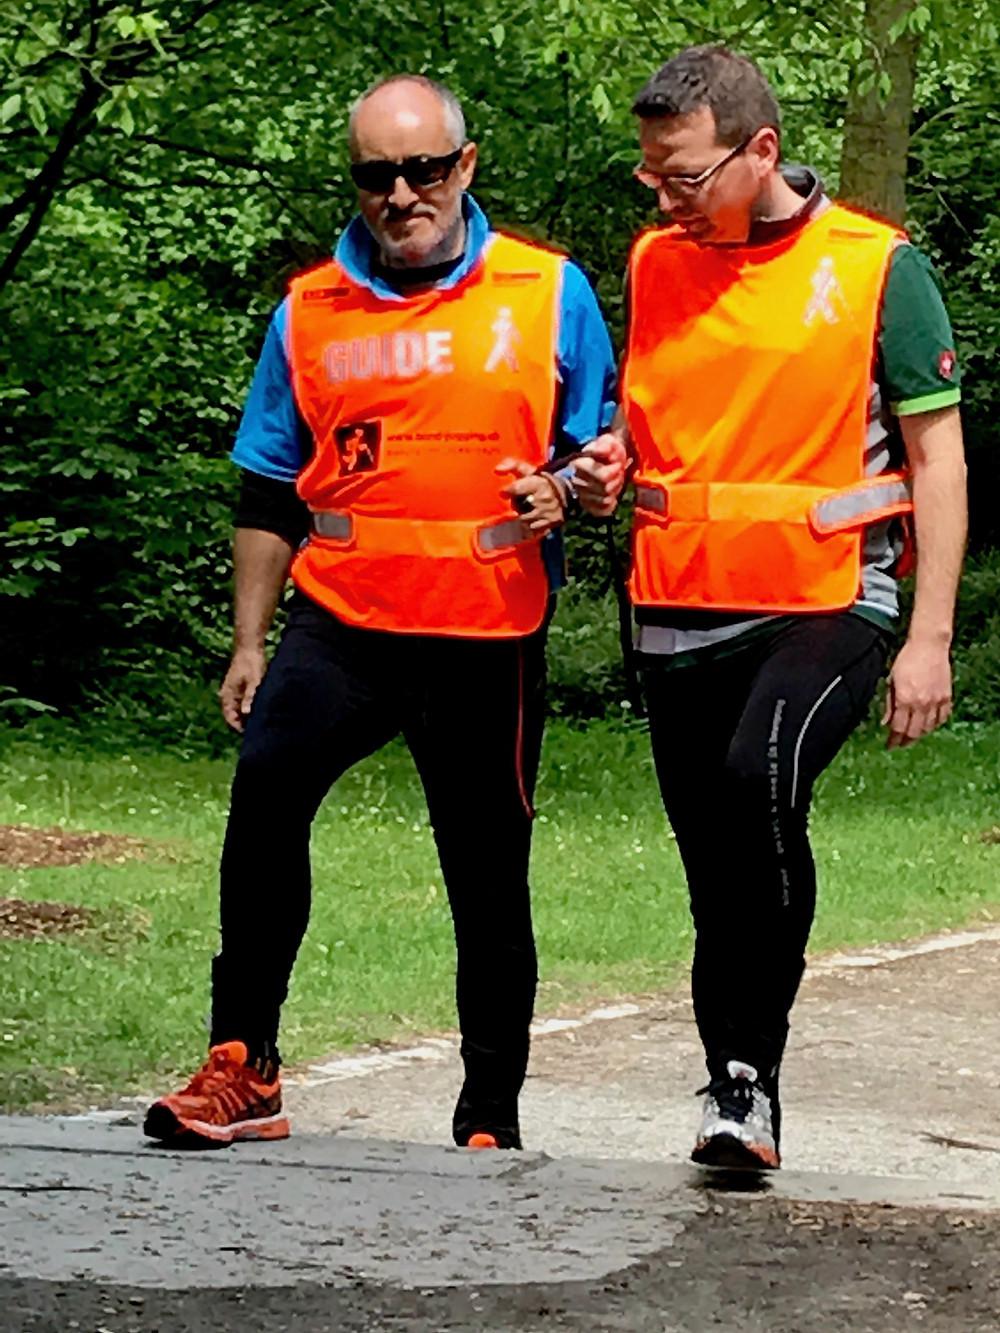 Laufinstinkt+® Augsburg - Blind-Jogging Bild 5